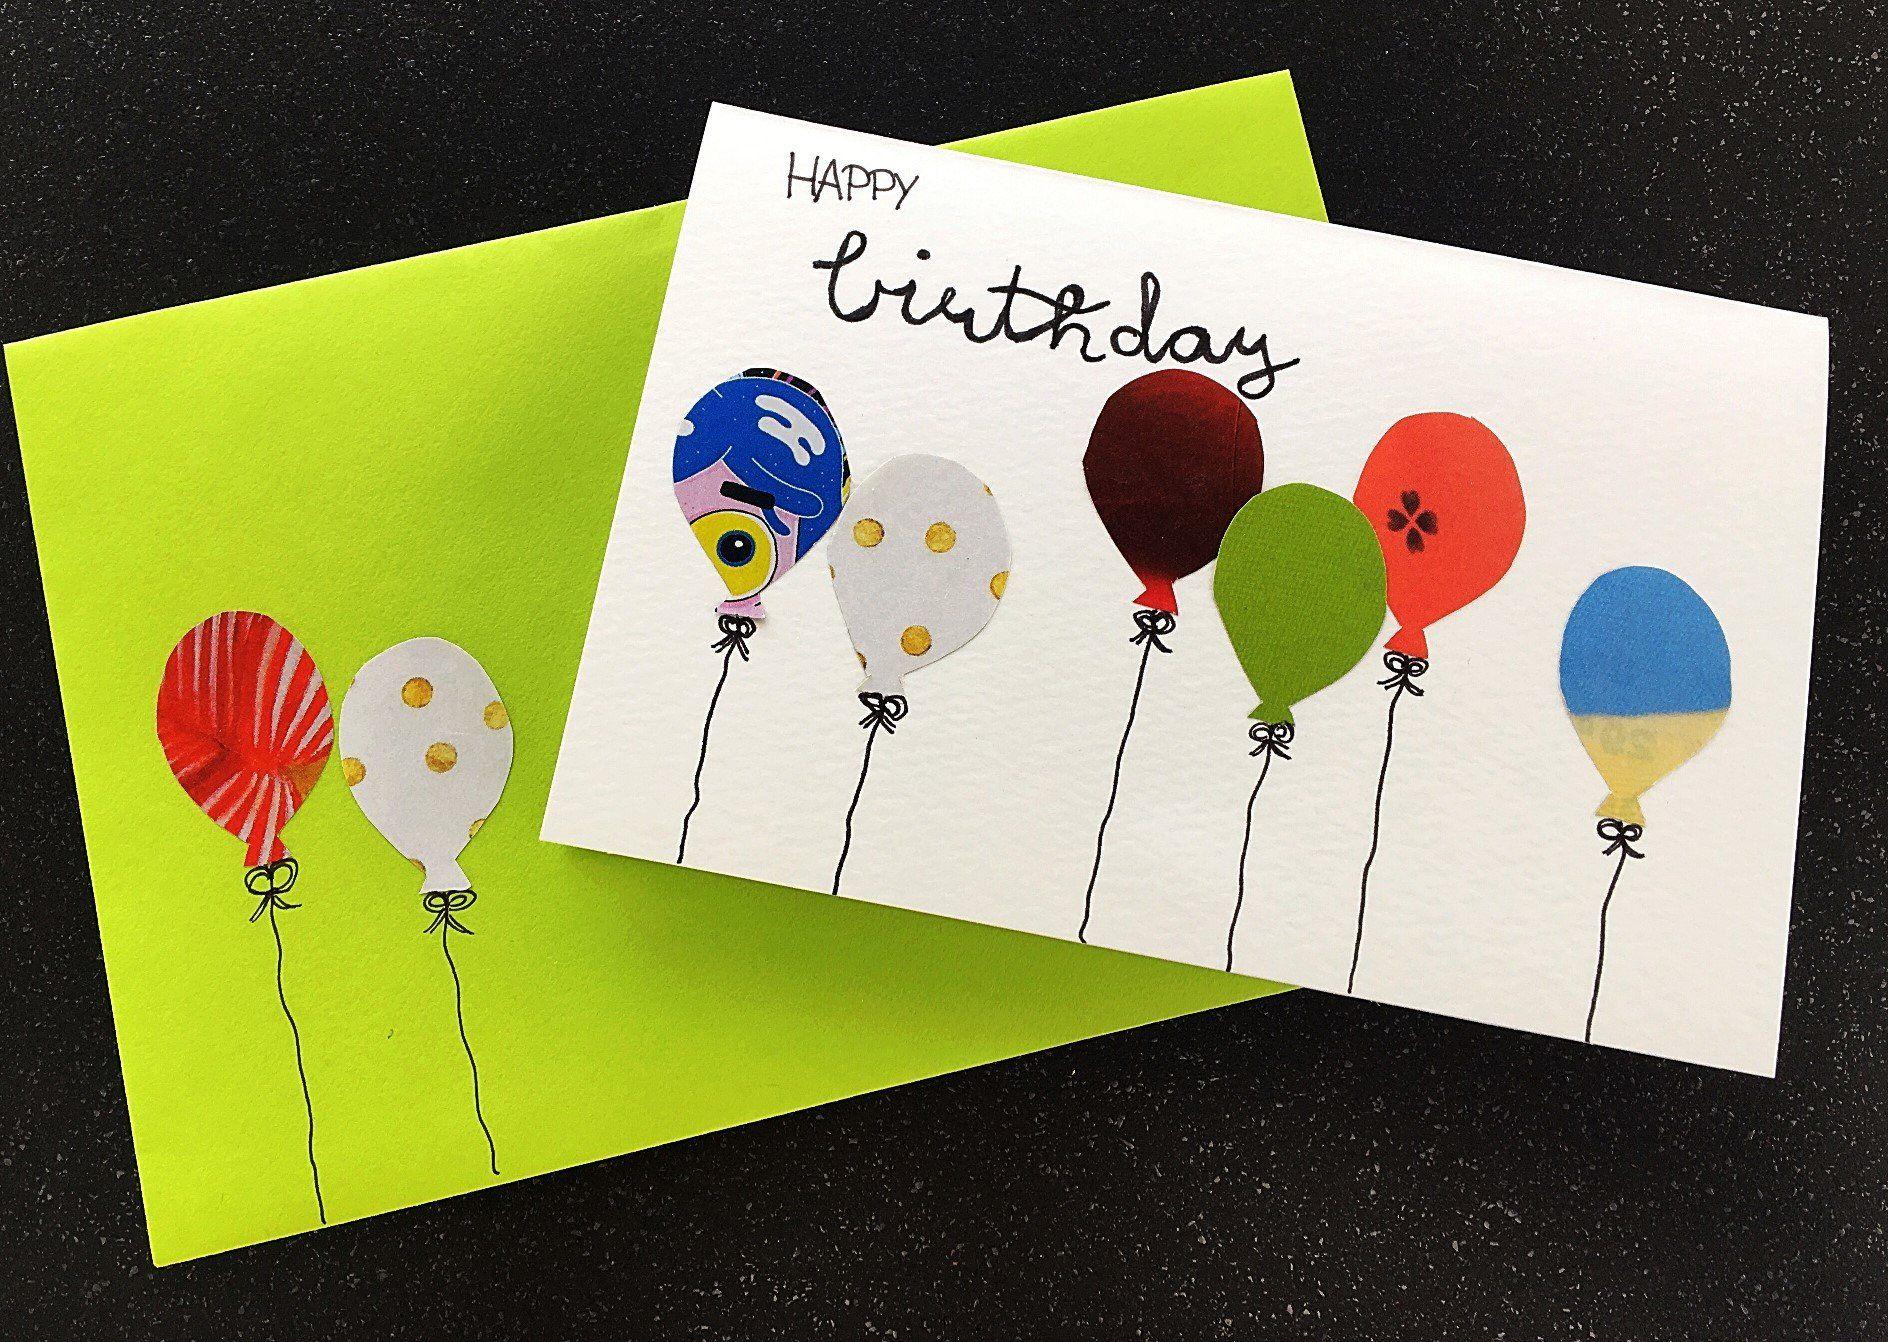 Geburtstagskarte Mit Luftballons Basteln Karte Luftballon Karte